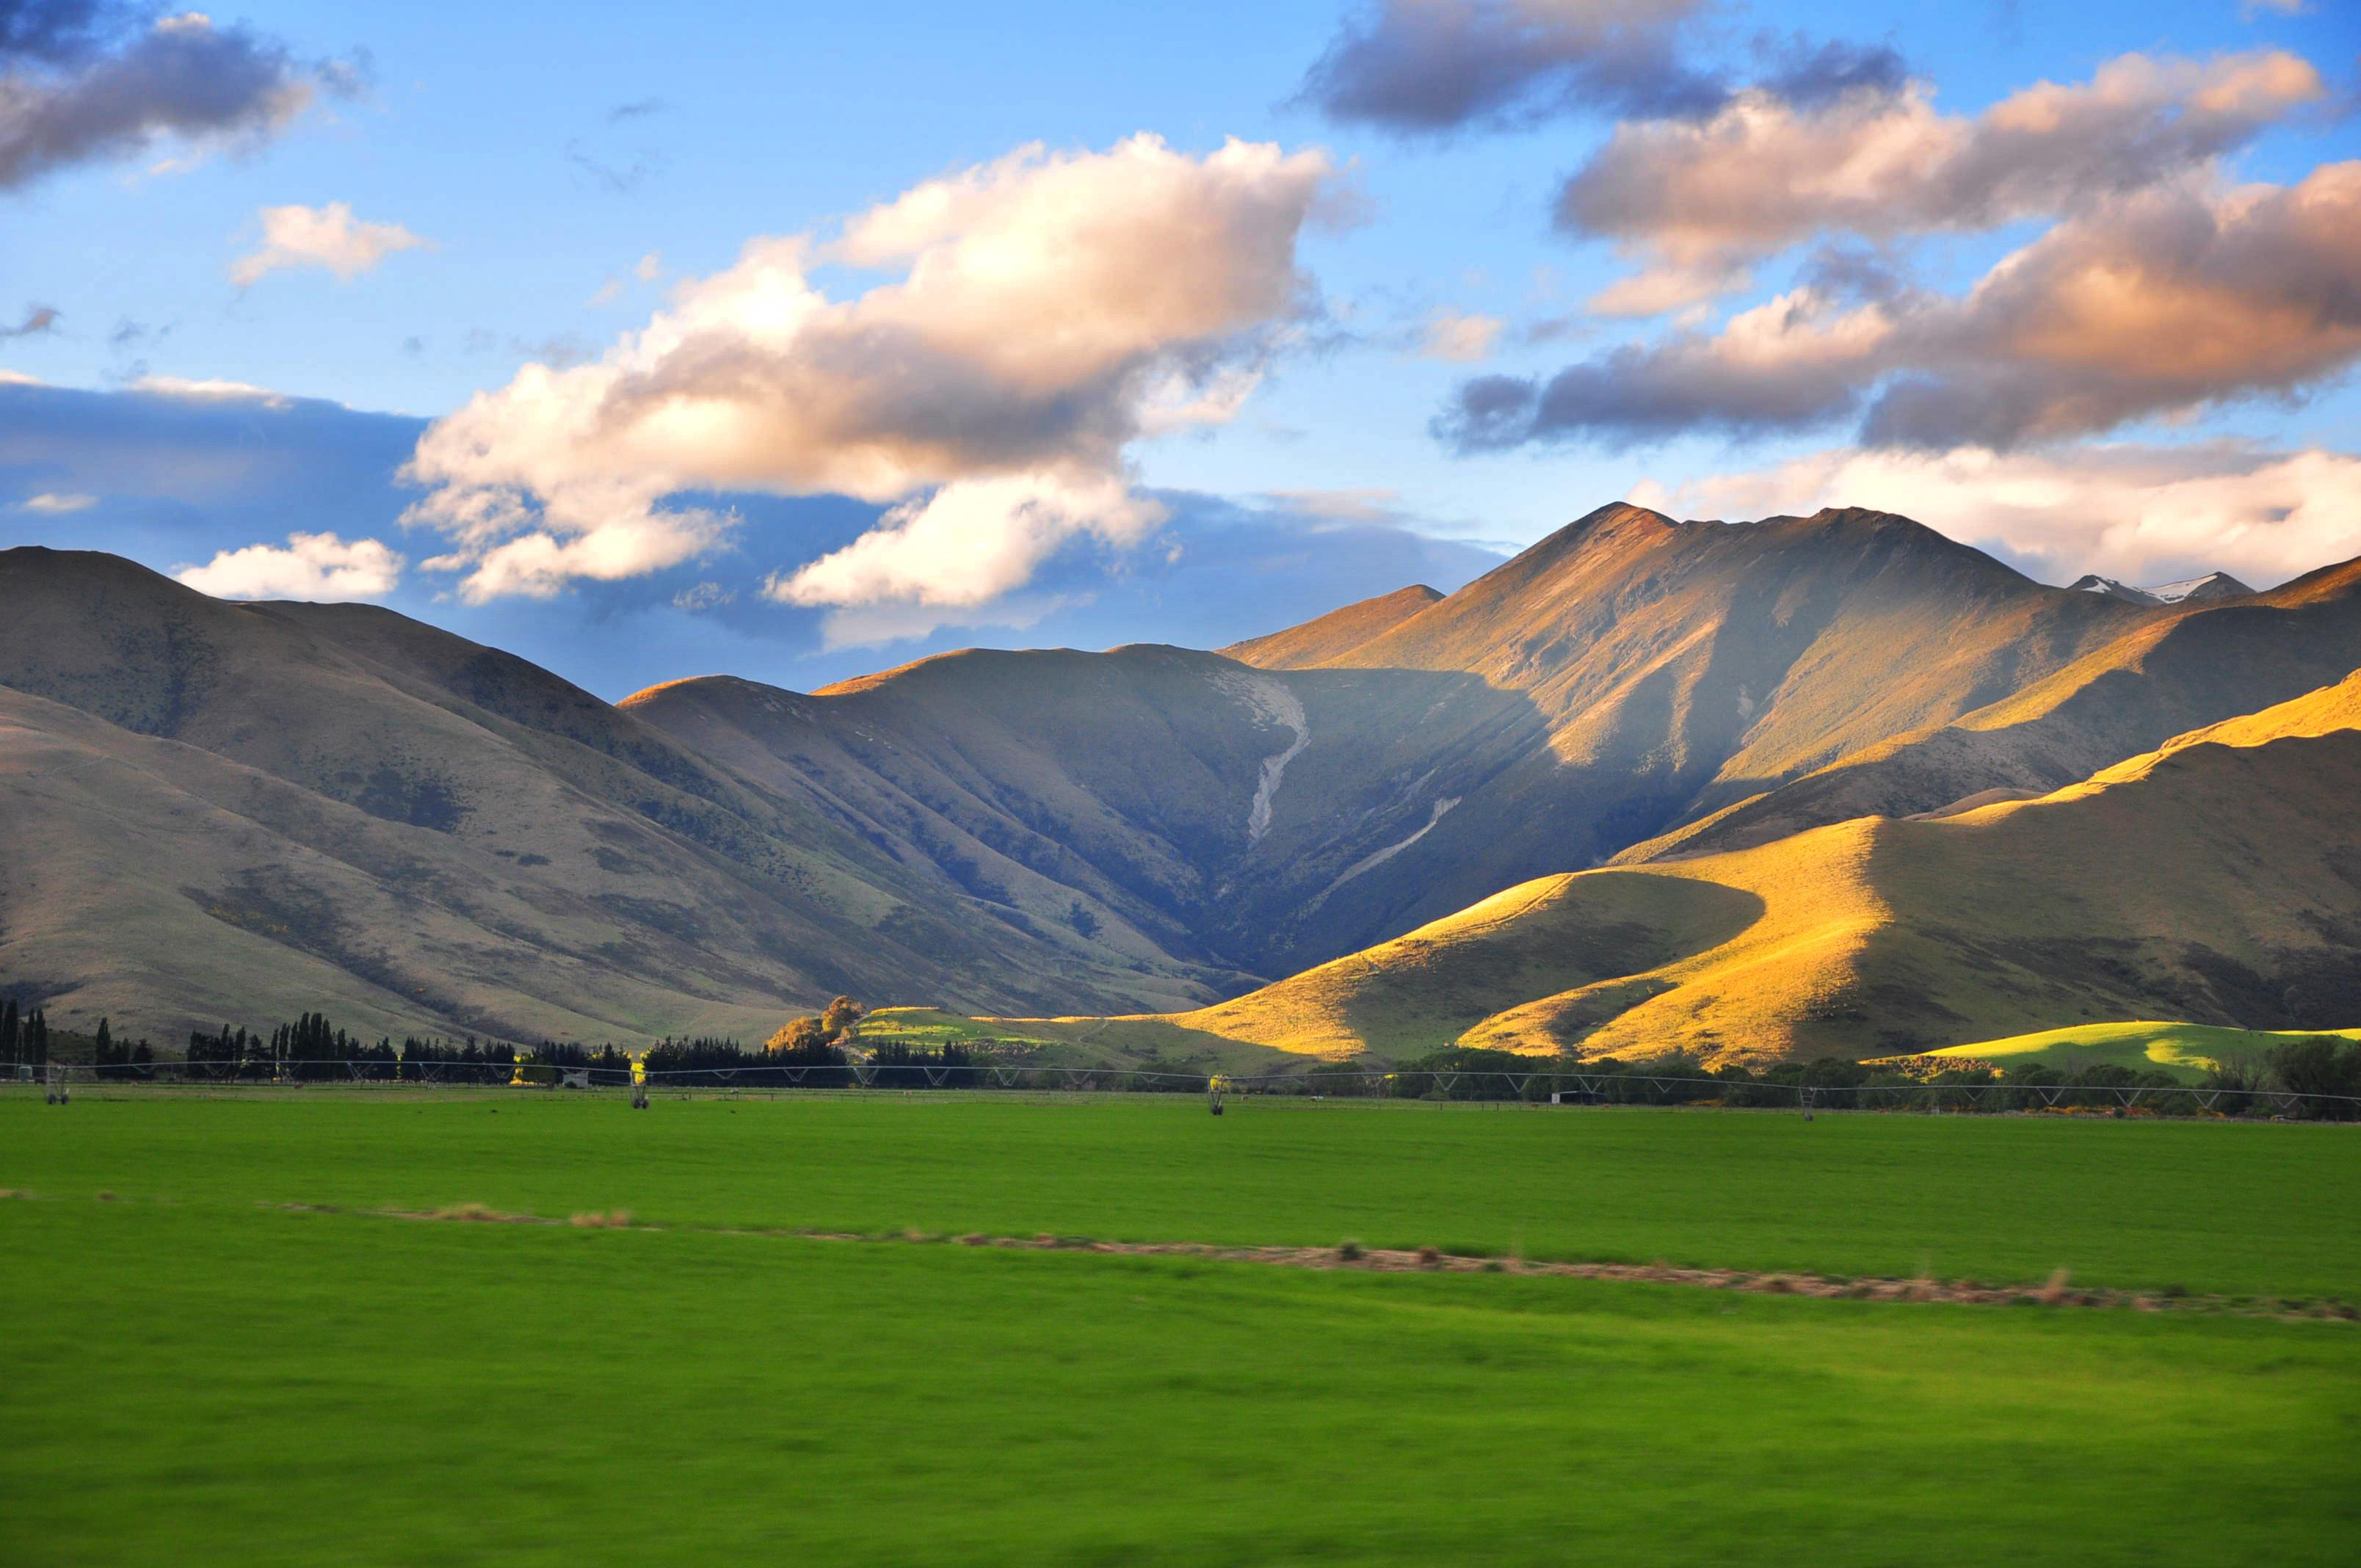 File:NZ Landscape from the van.jpg - Wikimedia Commons